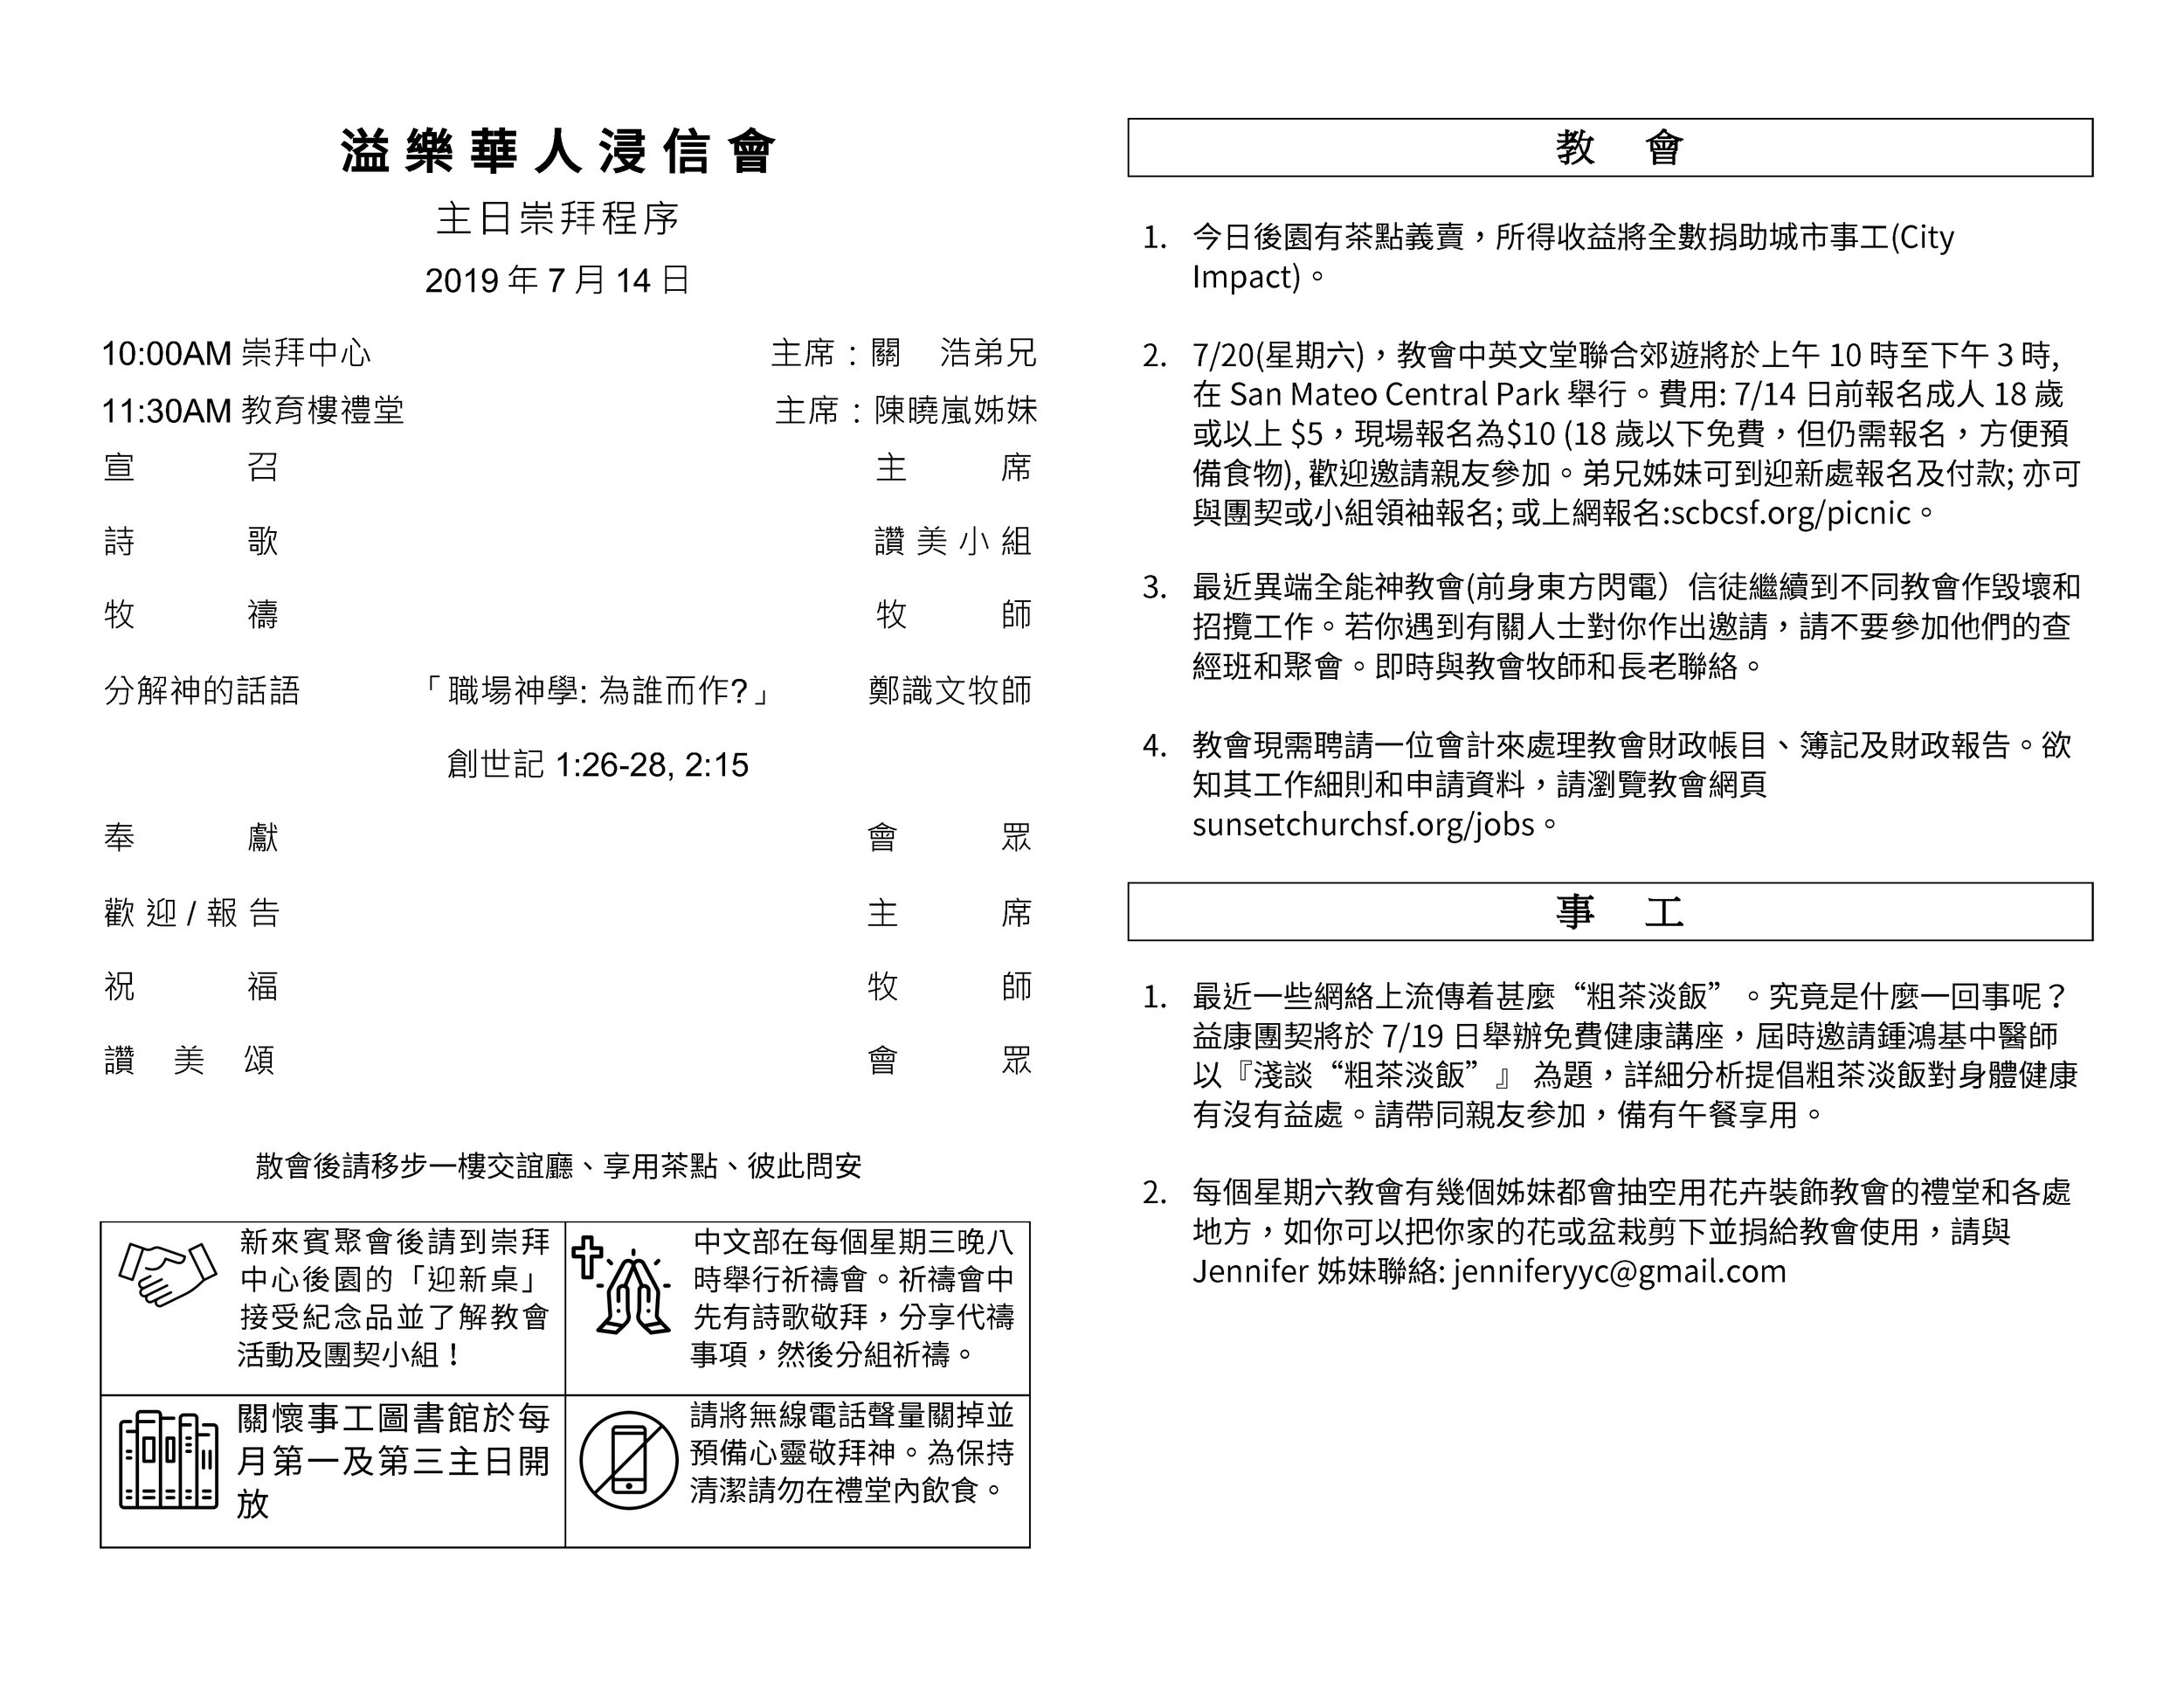 Chinese Bulletin 2019-7-14_Page_2.jpg